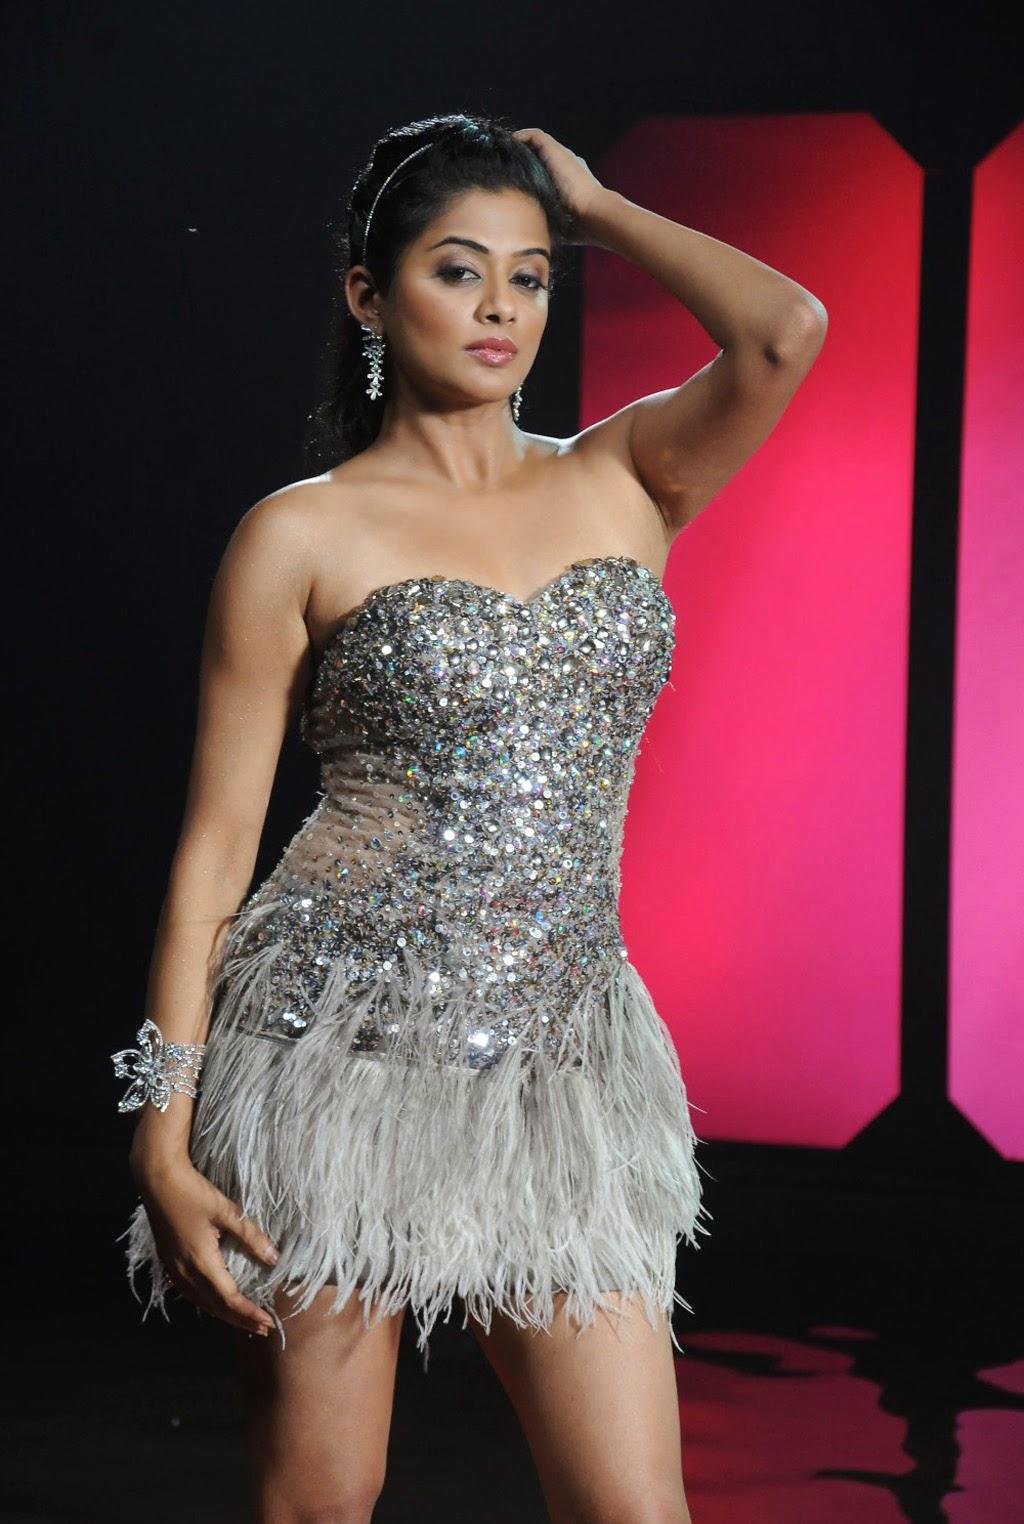 Actress Priyamani Hot Photos and Priya Mani Wallpapers ...